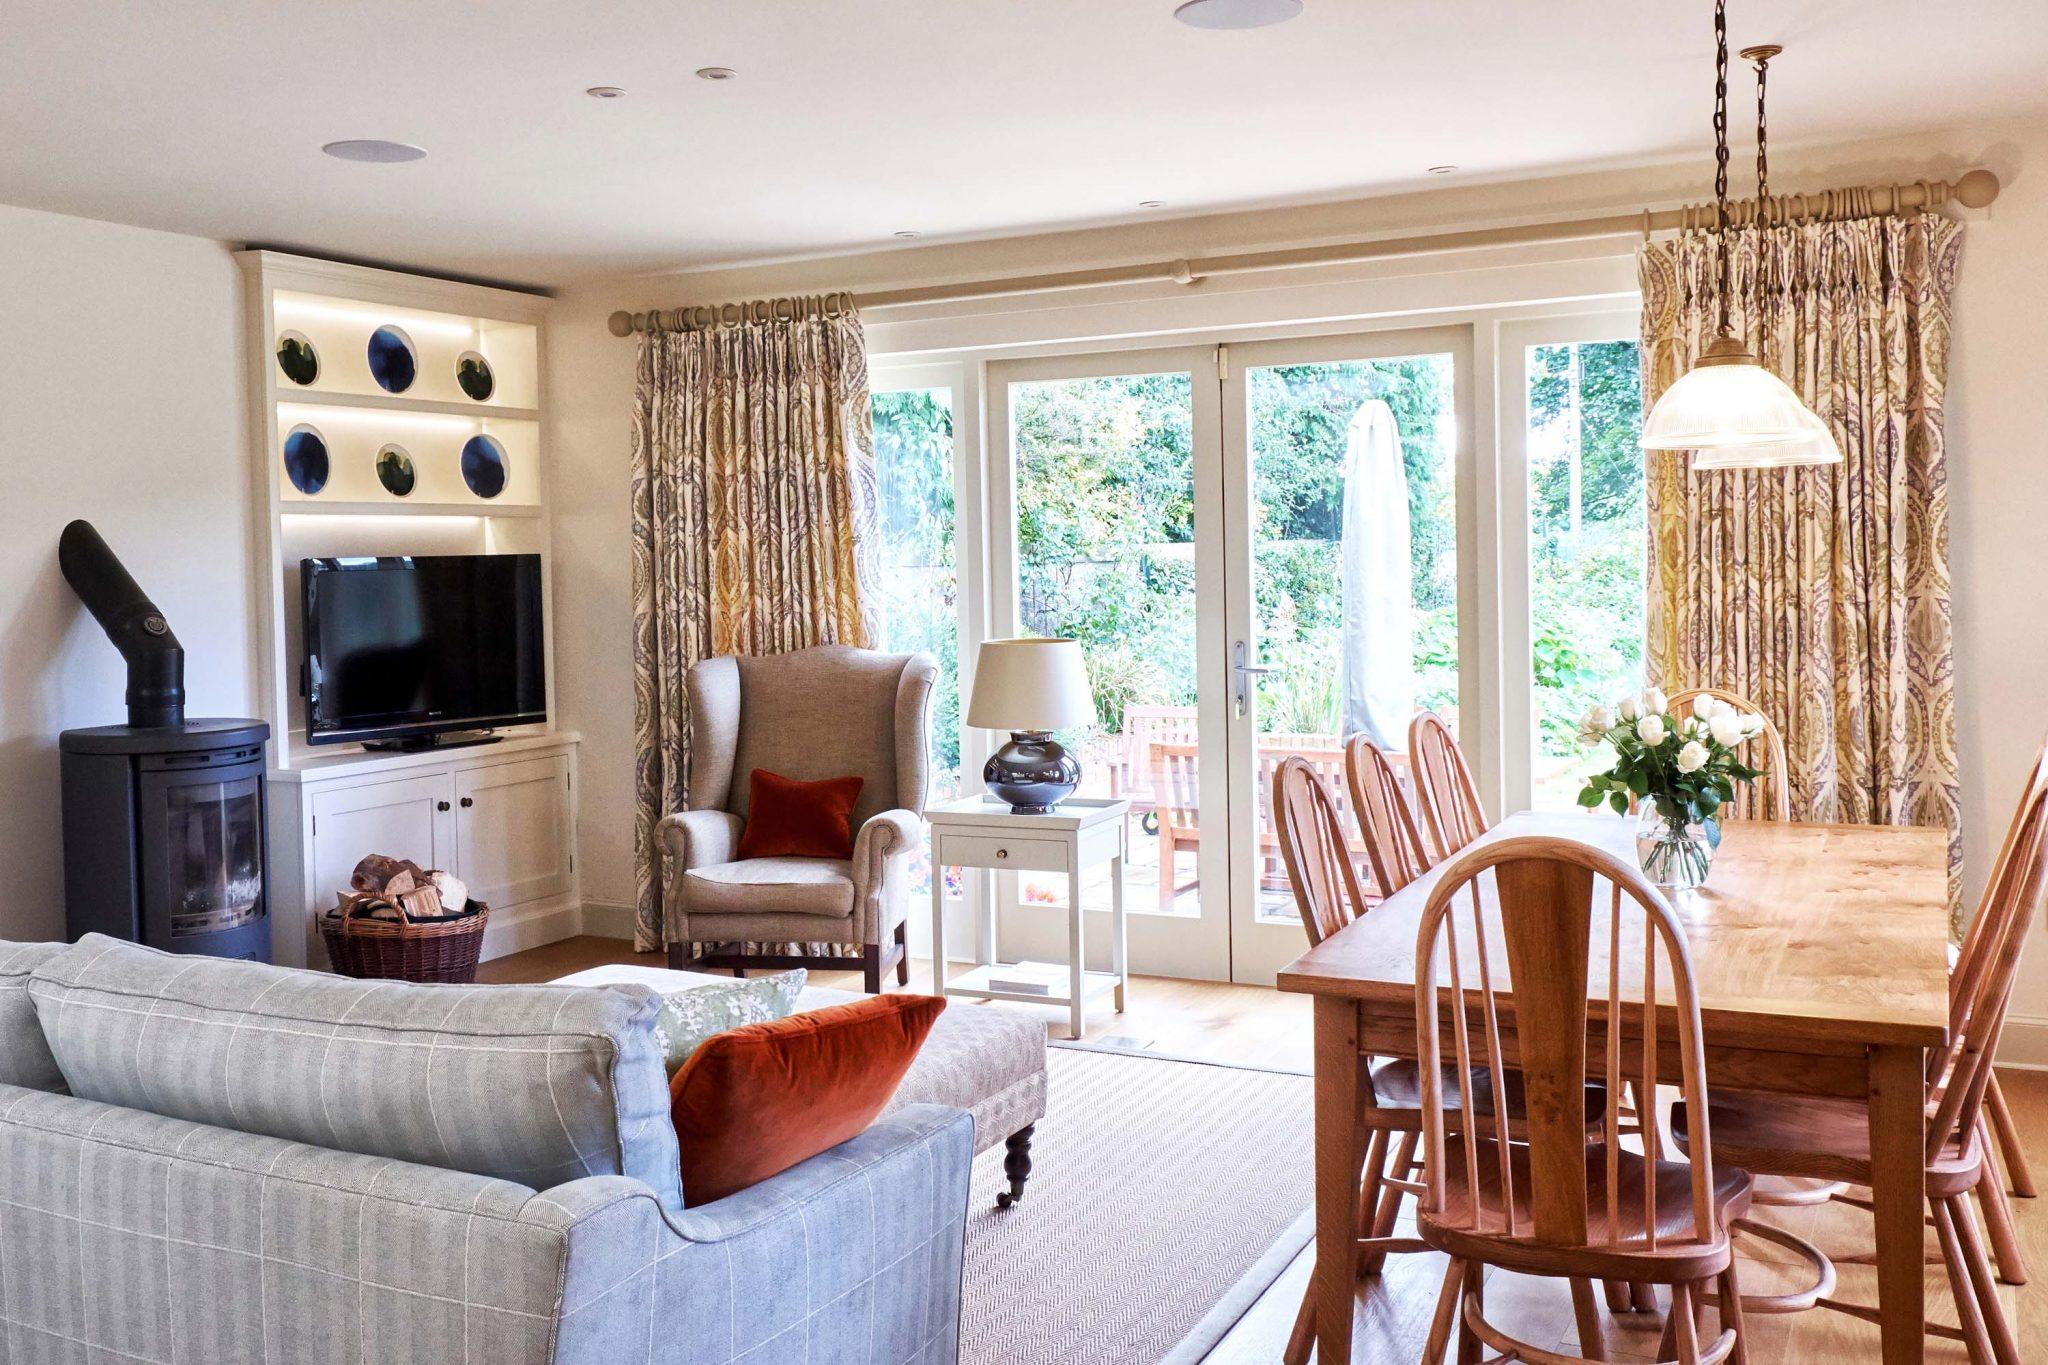 Fullsize Of Interior Design Living Room Photo